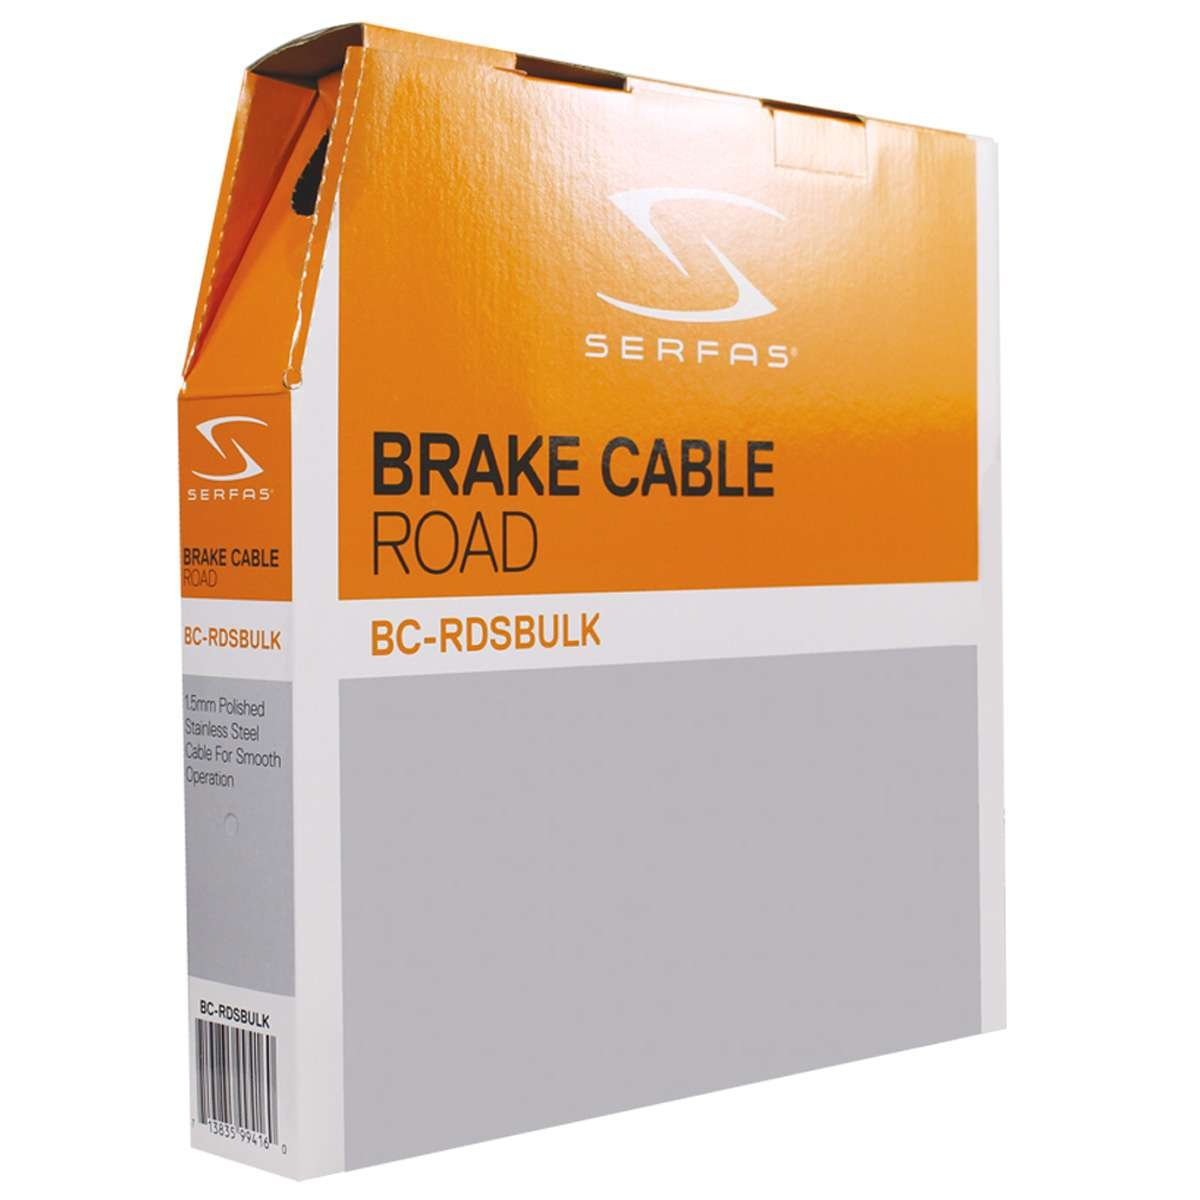 Serfas Road Bicycle Stainless Steel Bicycle Brake Cable - Bulk Box - BC-RDSBULK